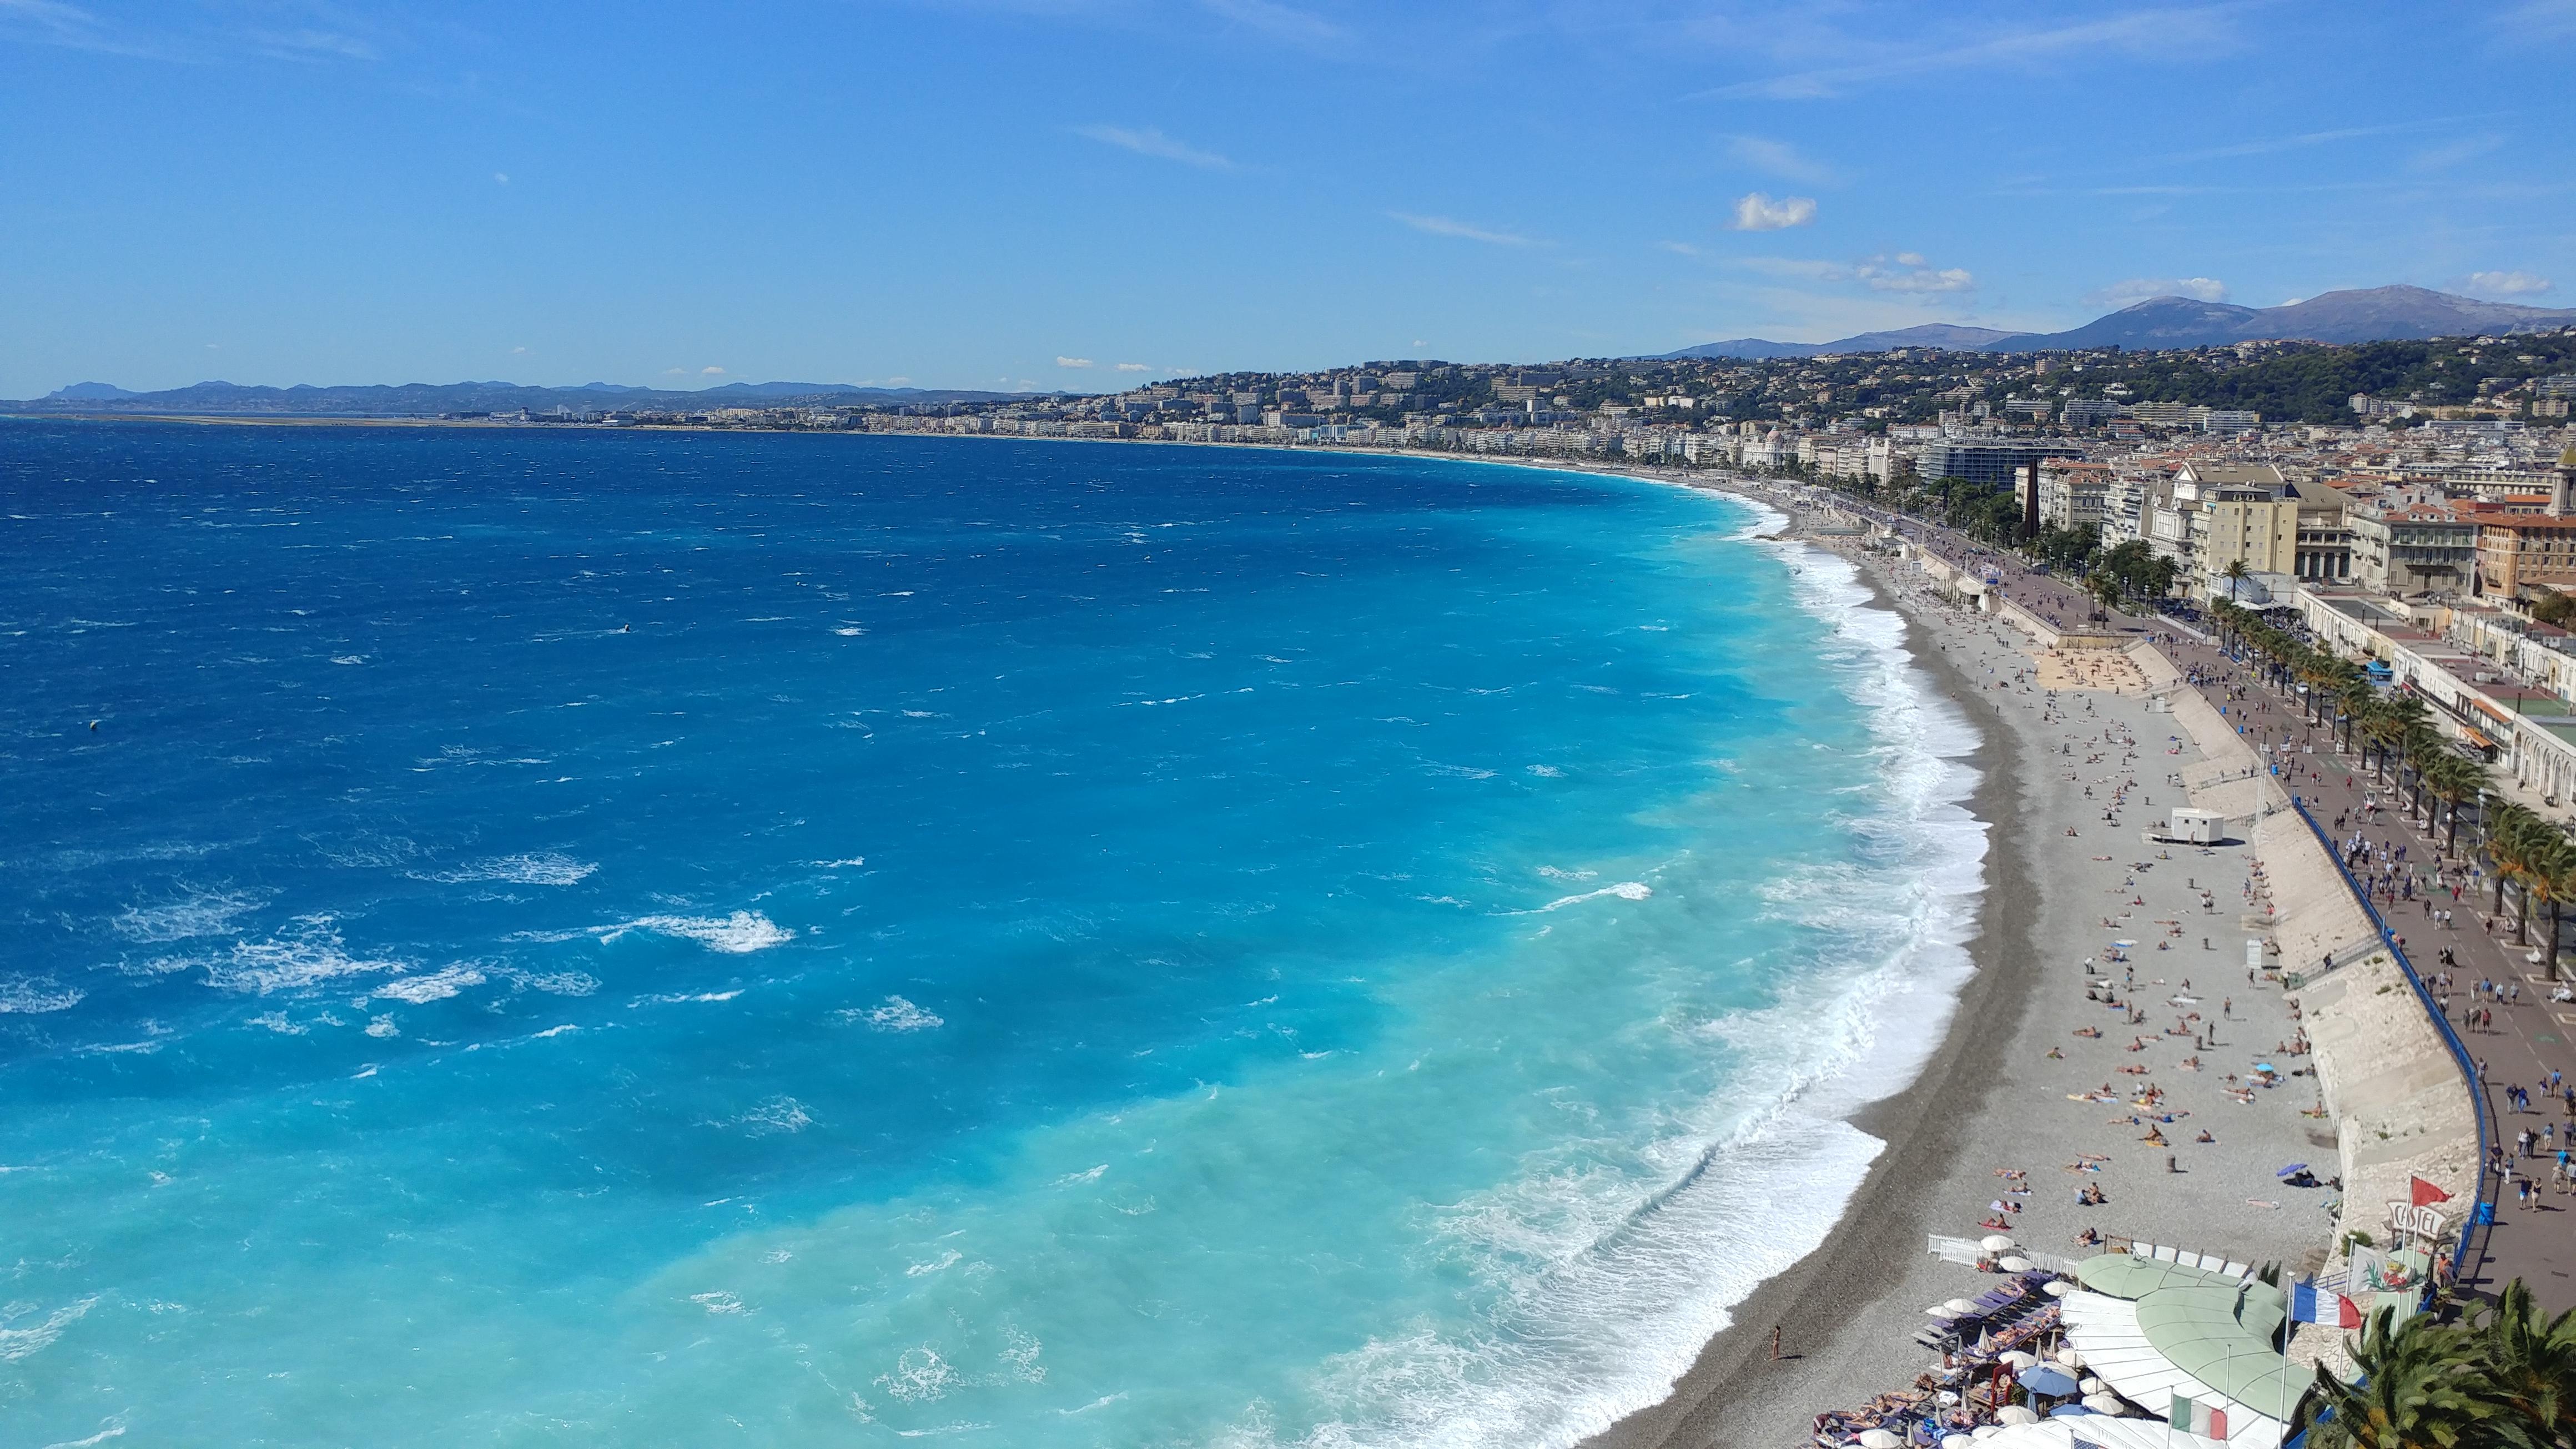 Promenade des Anglais Nice France Europe voyage destination paysage